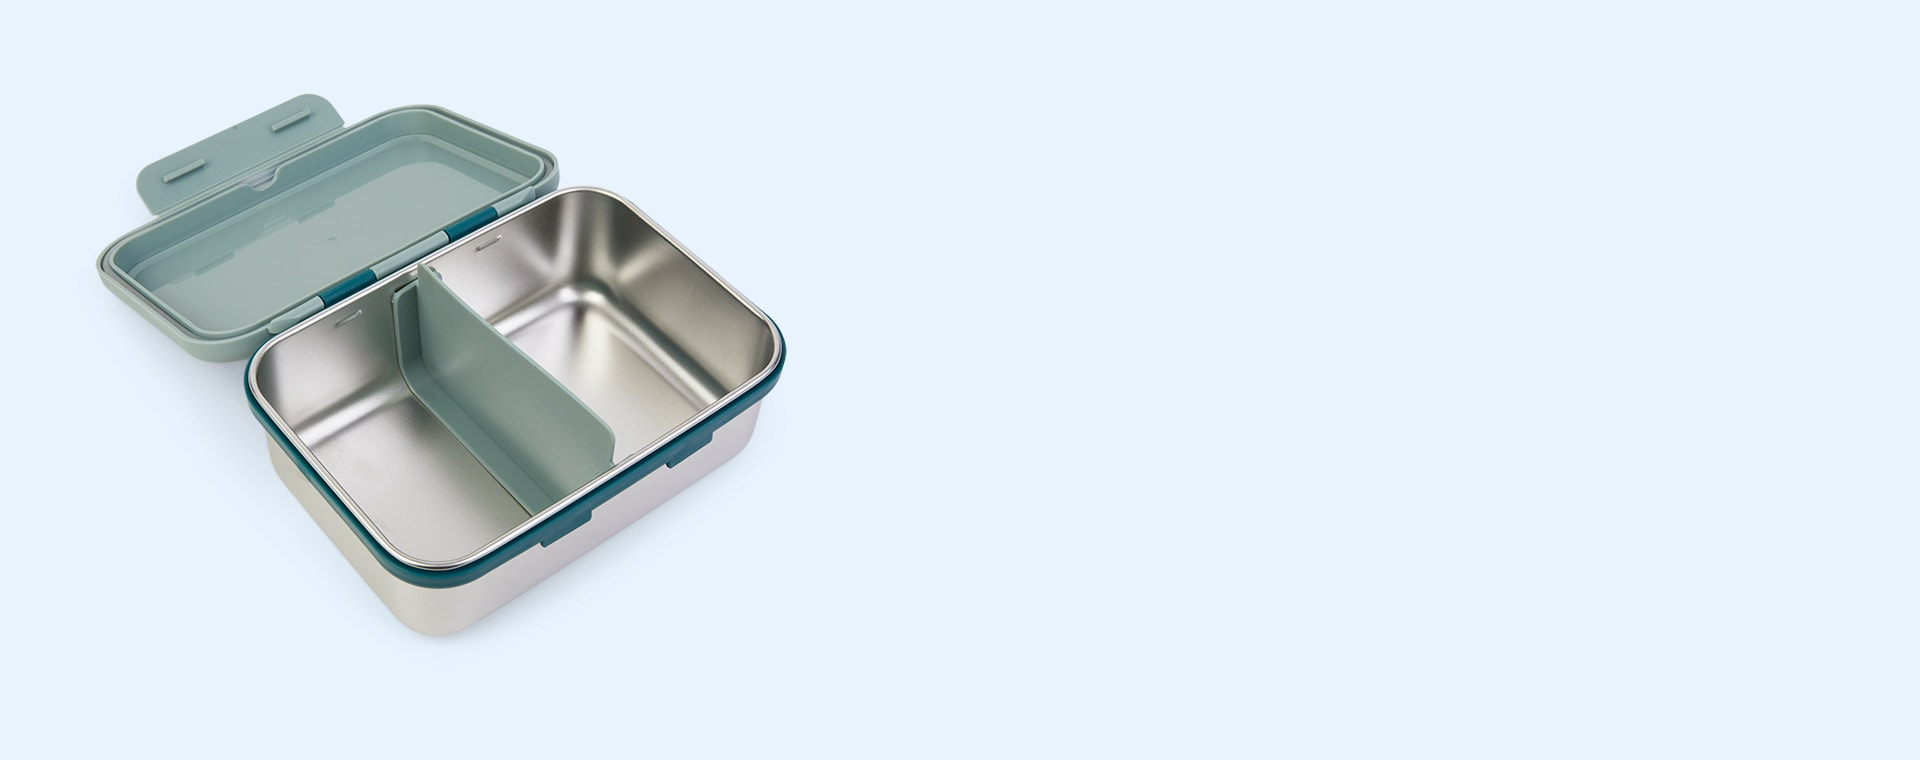 Adventure Bus Lassig Lunchbox Stainless Steel